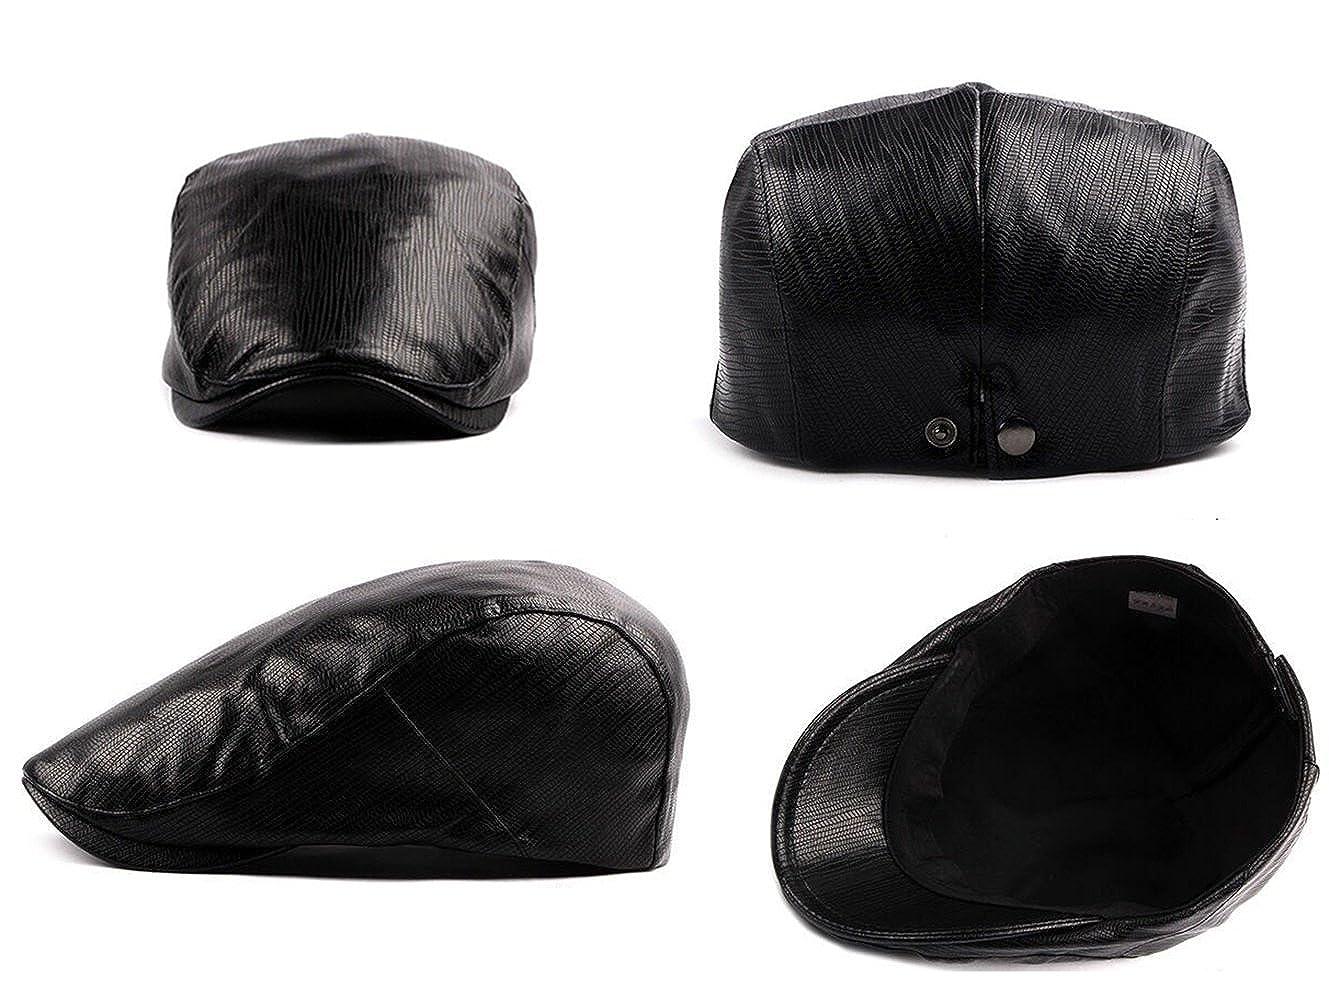 9d888c4c17598 Mens Flat Cap Adjustable Leather Beret Vintage Gatsby Golf newsboy Hat In 3  Colours (Black)  Amazon.co.uk  Clothing